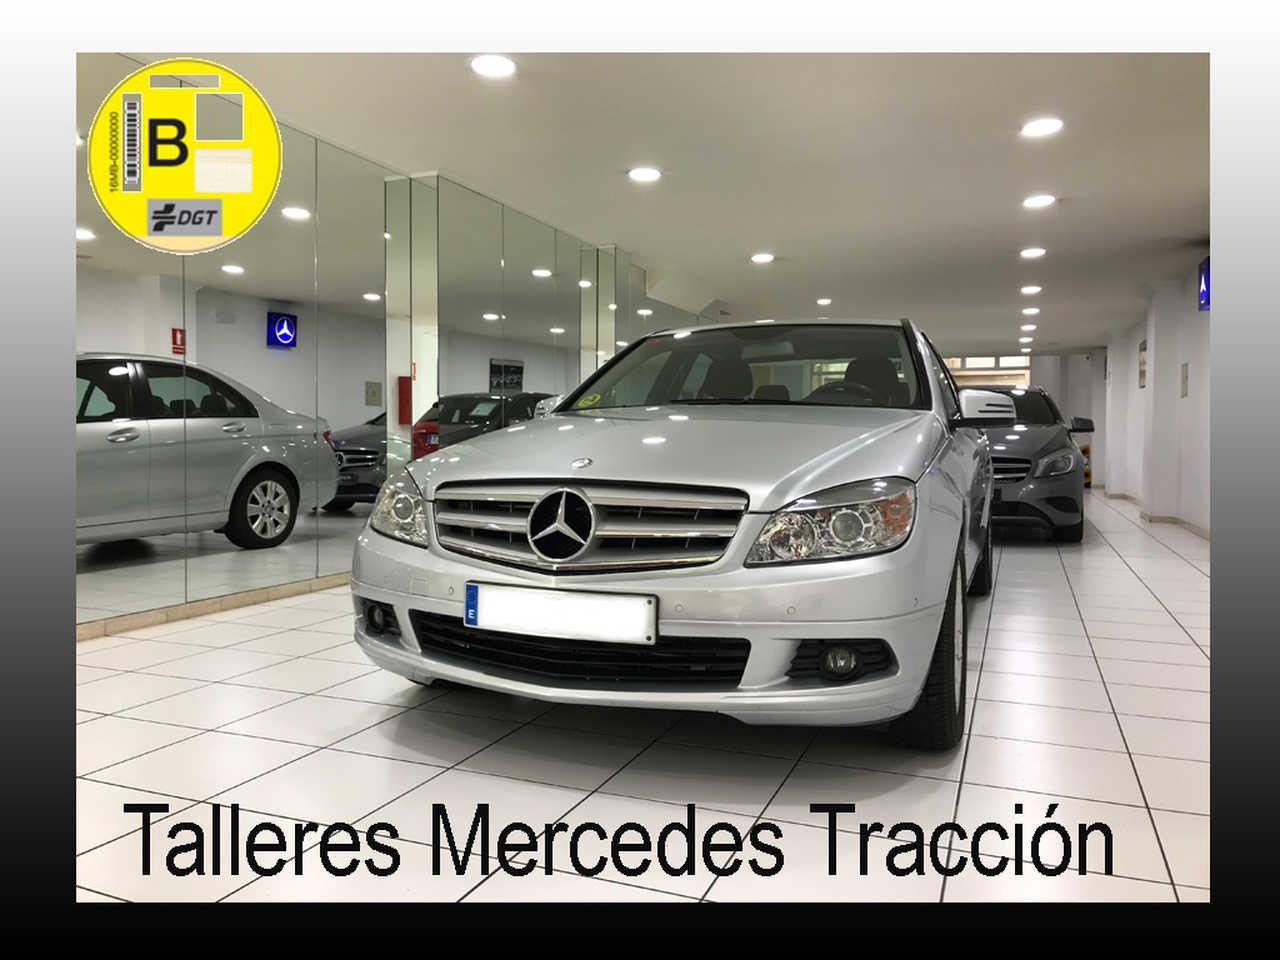 Mercedes Clase C 220 CDI BE Edition/Automático/Comand/51.000 km   - Foto 1